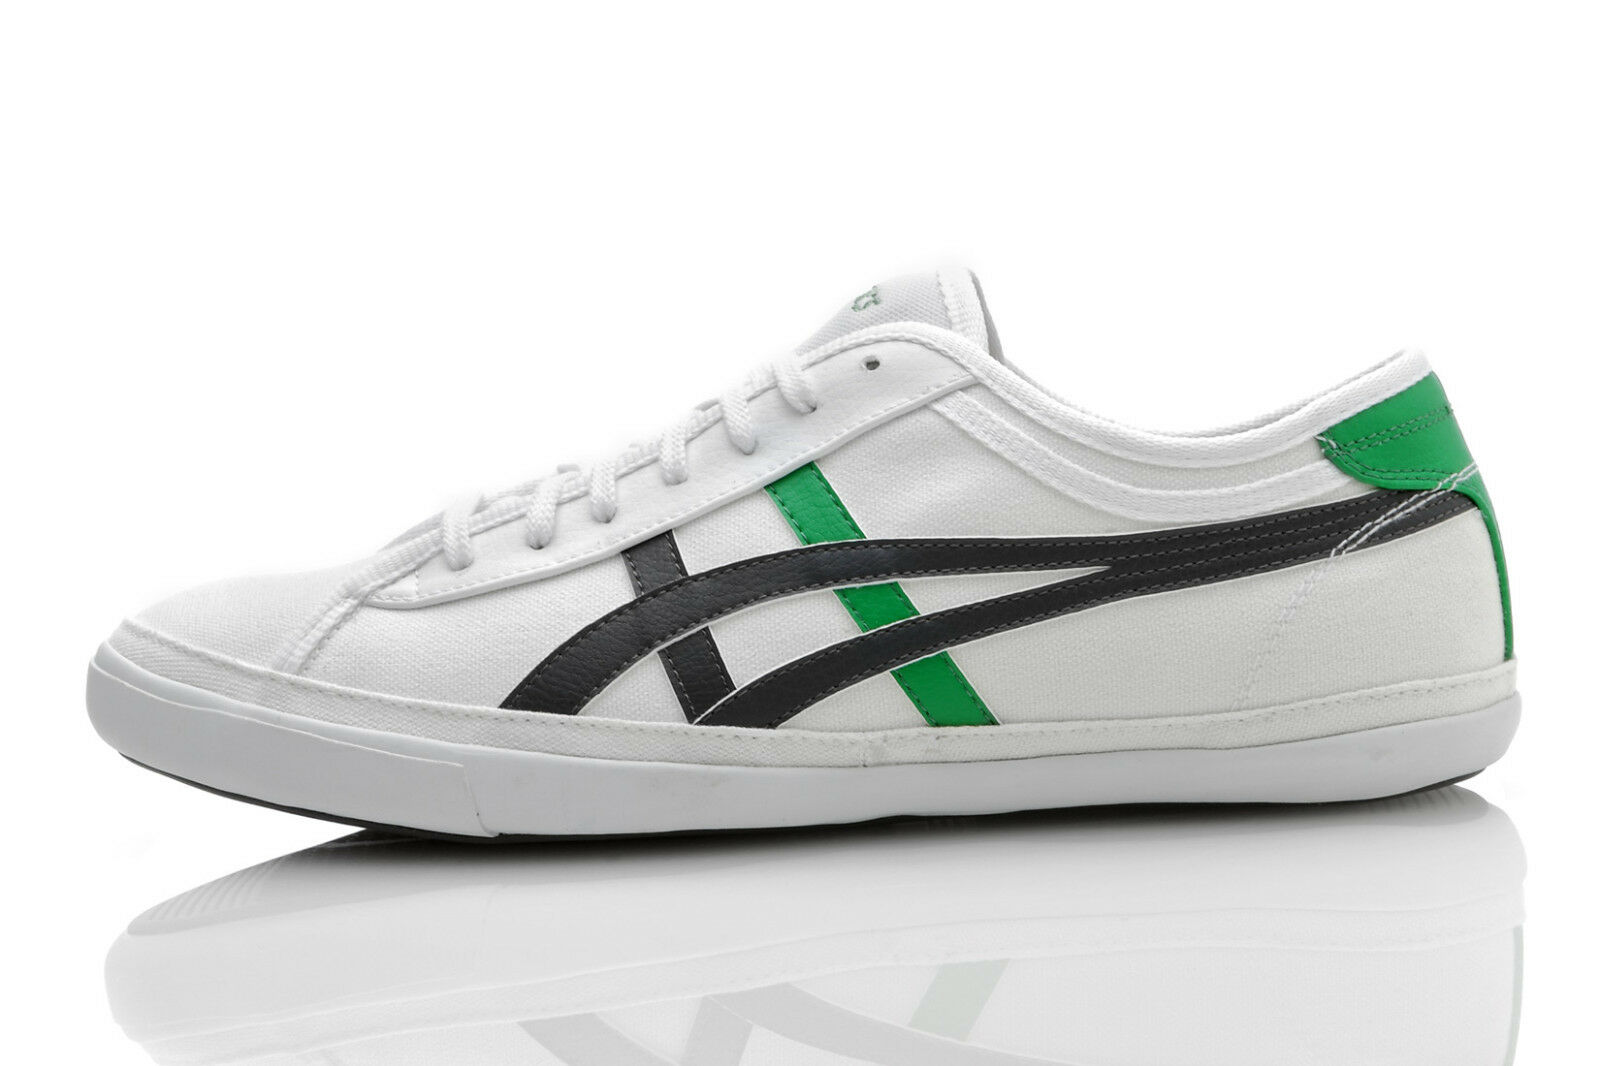 Prix Asics Biku Rare Sneaker Recomfemmedé Hommes Cv Chaussures qFTwXZ7x